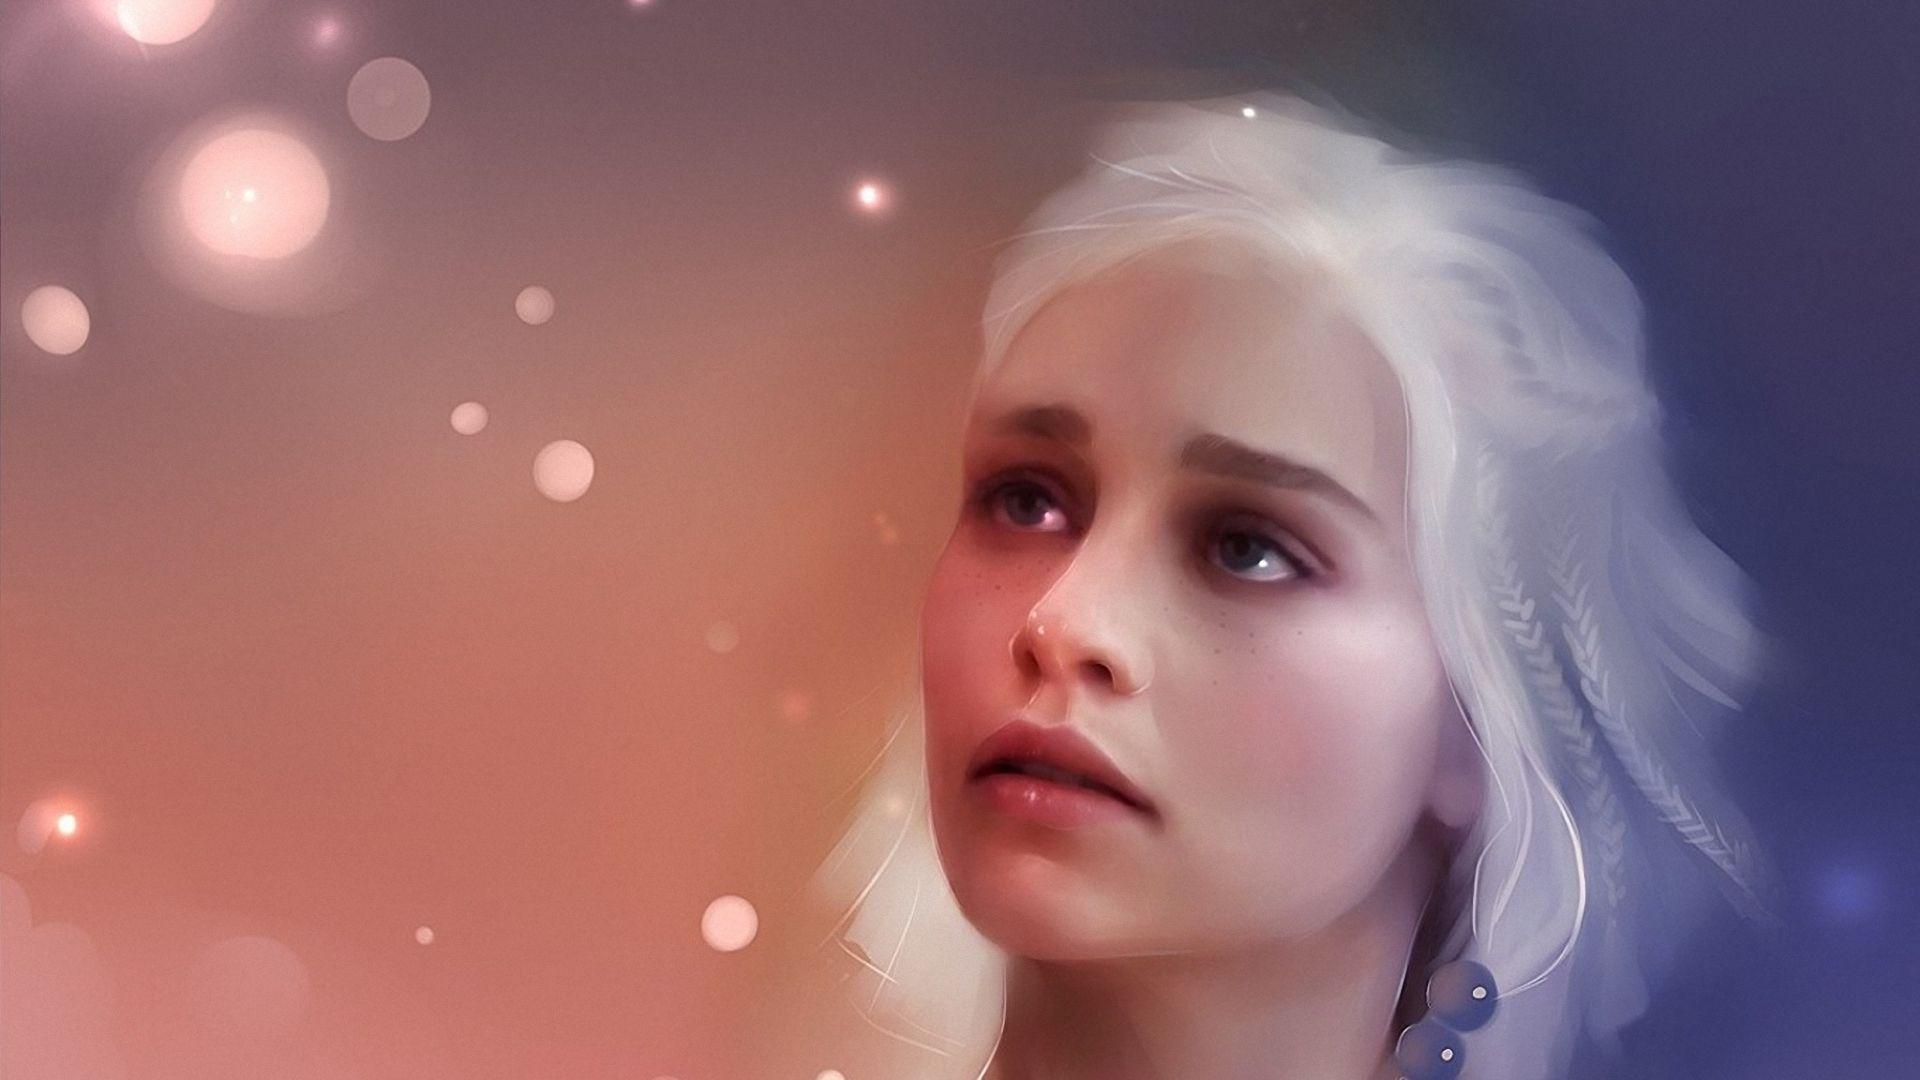 Game of Thrones Daenerys art wallpaper